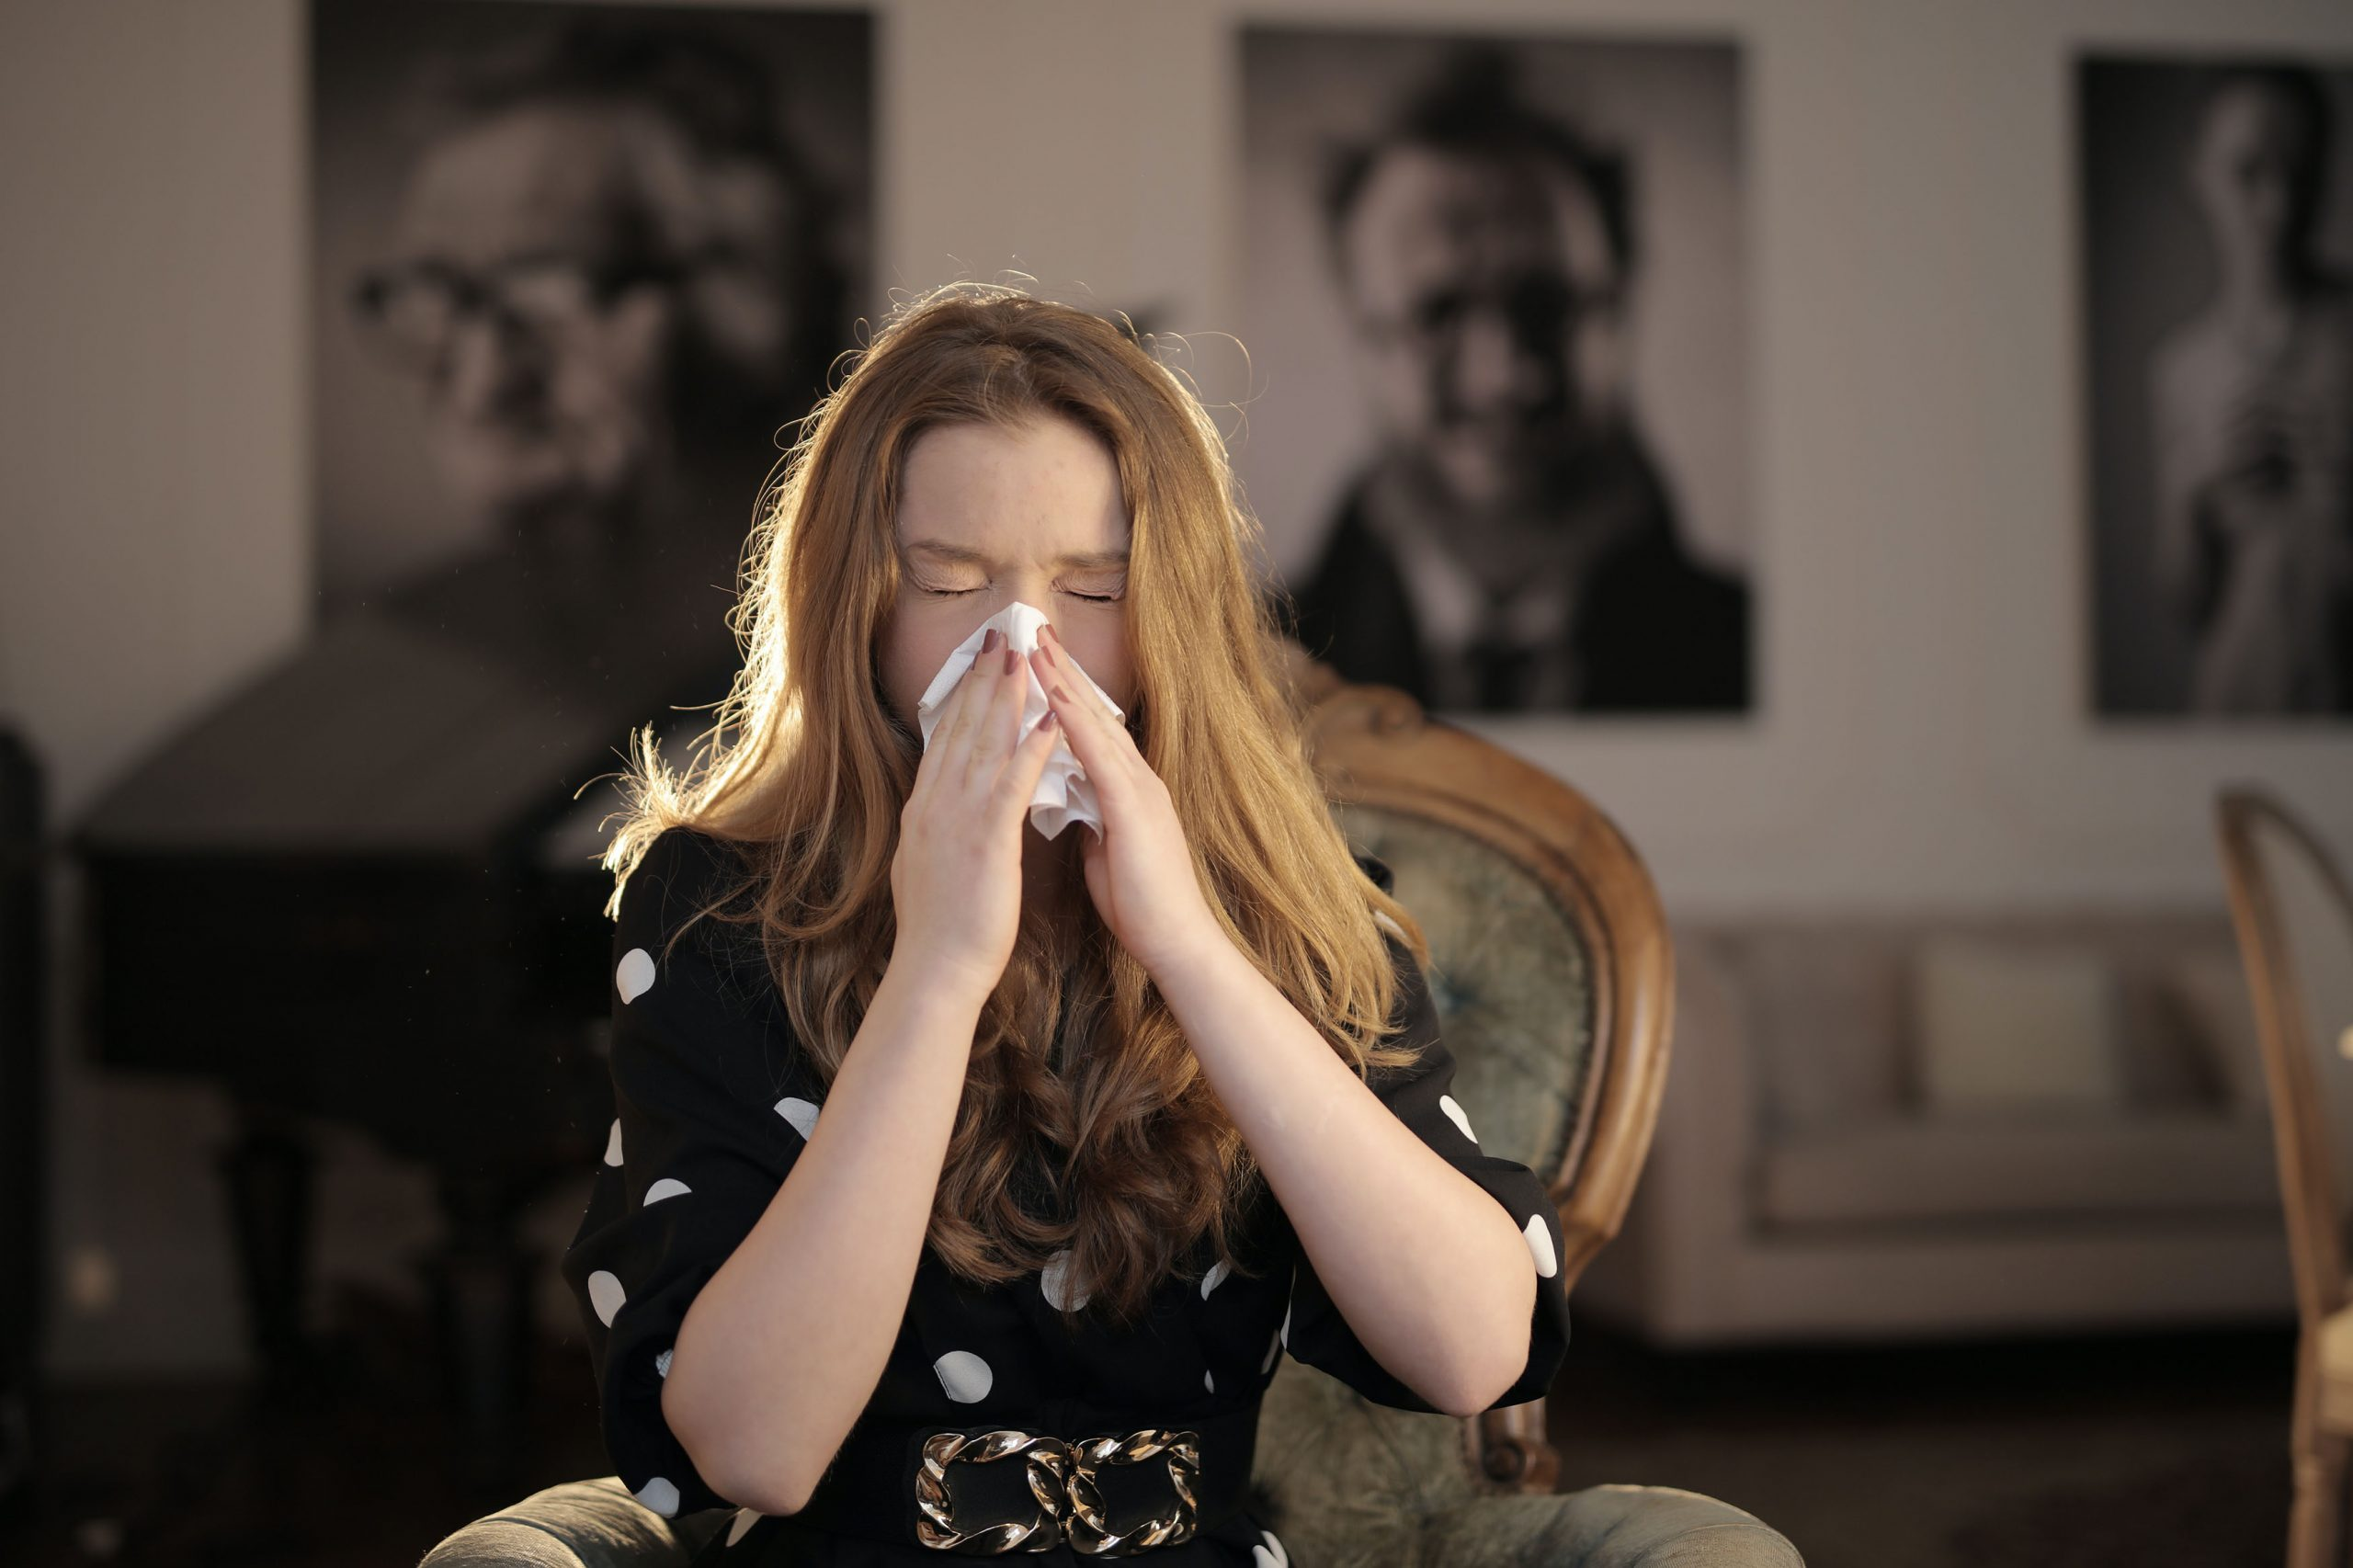 Alergias podem afetar o sono